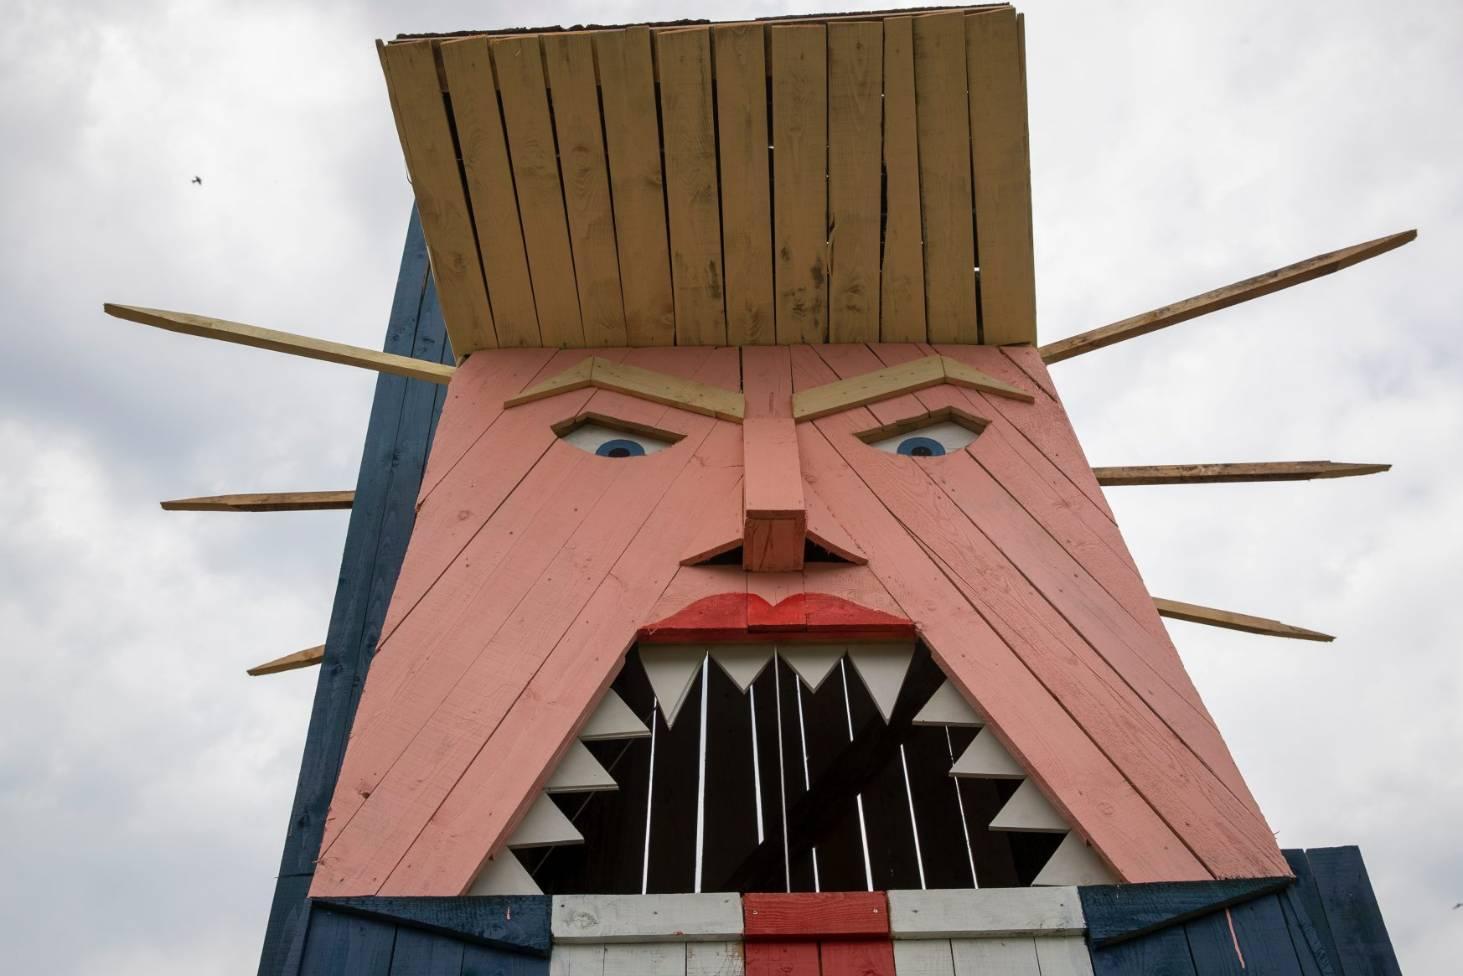 Donald Trump Gets Strange Statue In Melania S Homeland Of Slovenia Stuff Co Nz